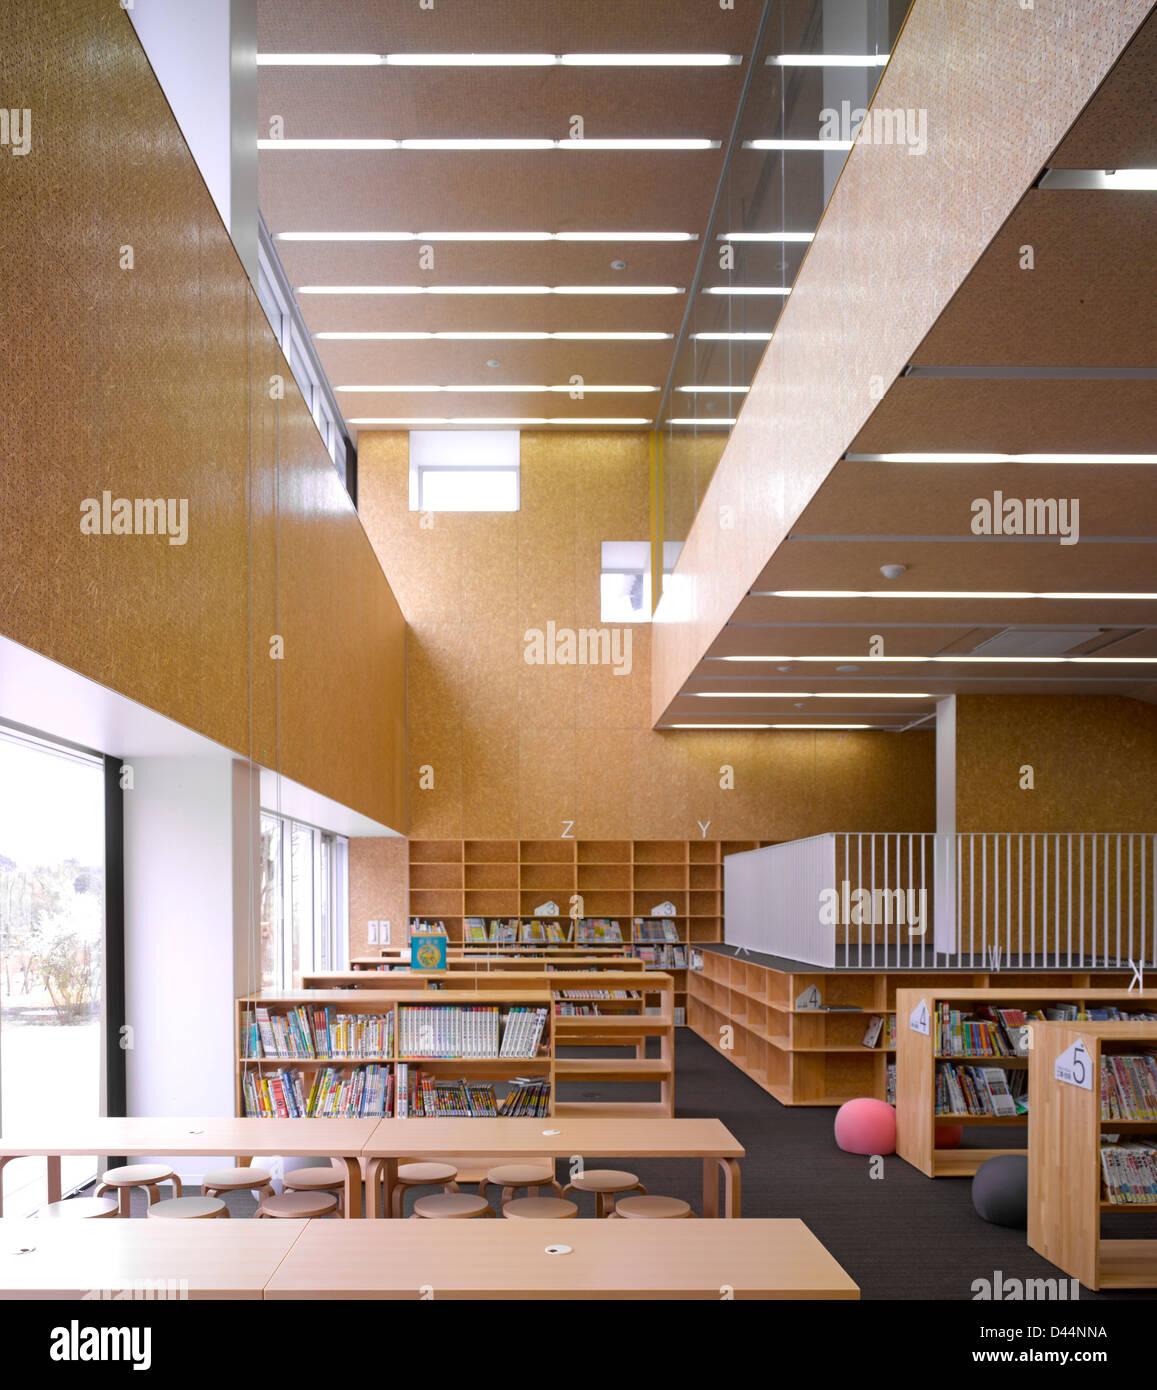 Teikyo University Elementary School, Tokyo, Japan. Architect: Kengo Kuma,  2012. Interior View Library.